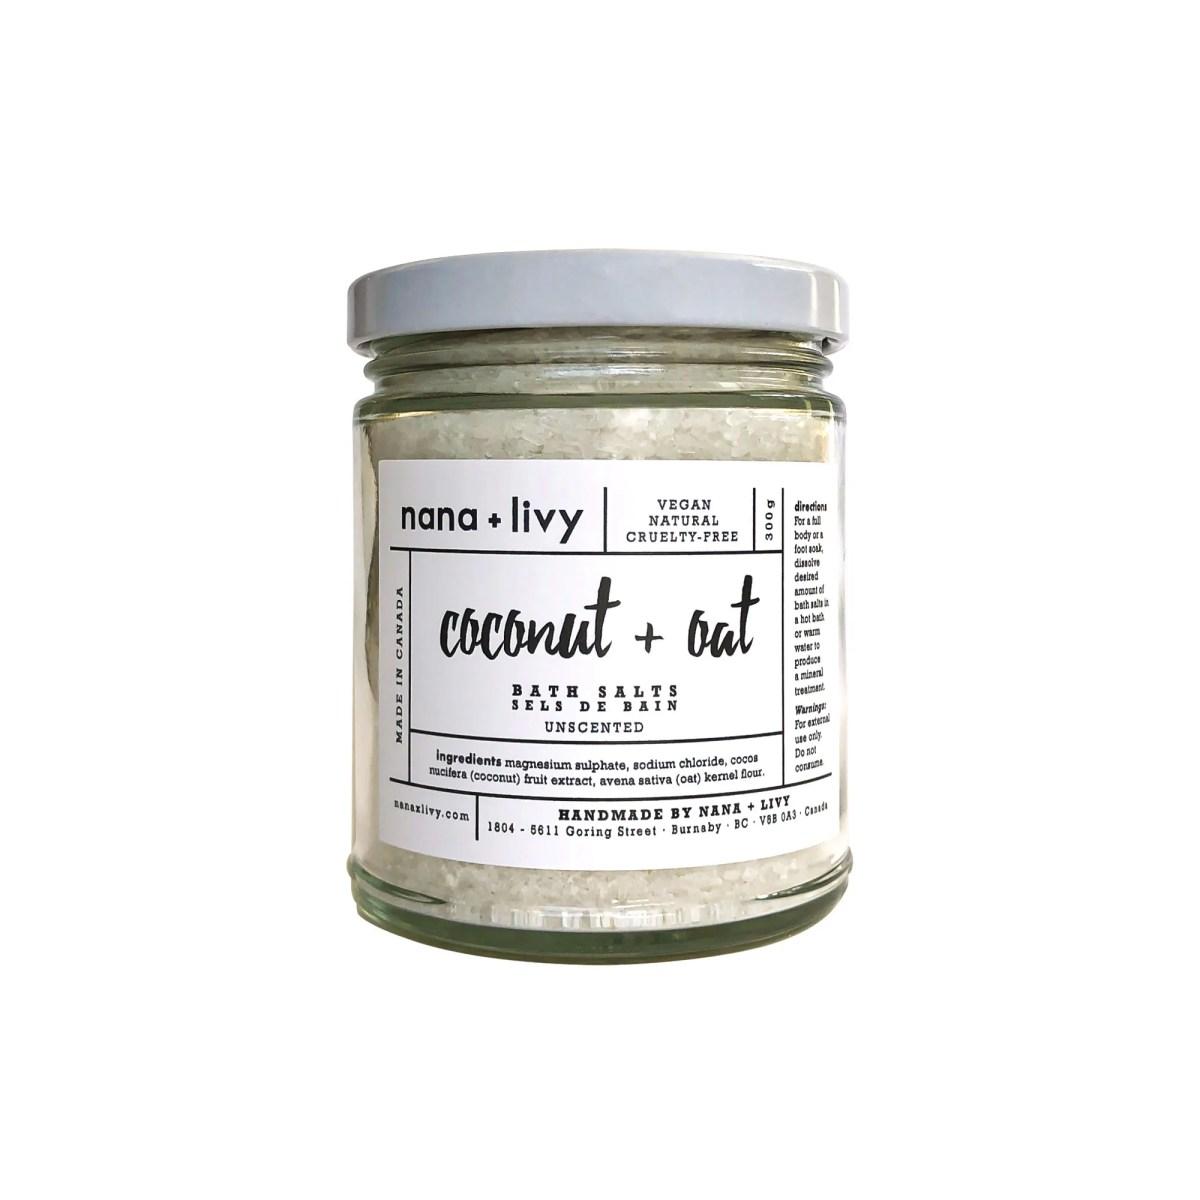 Coconut + Oat Bath Salts